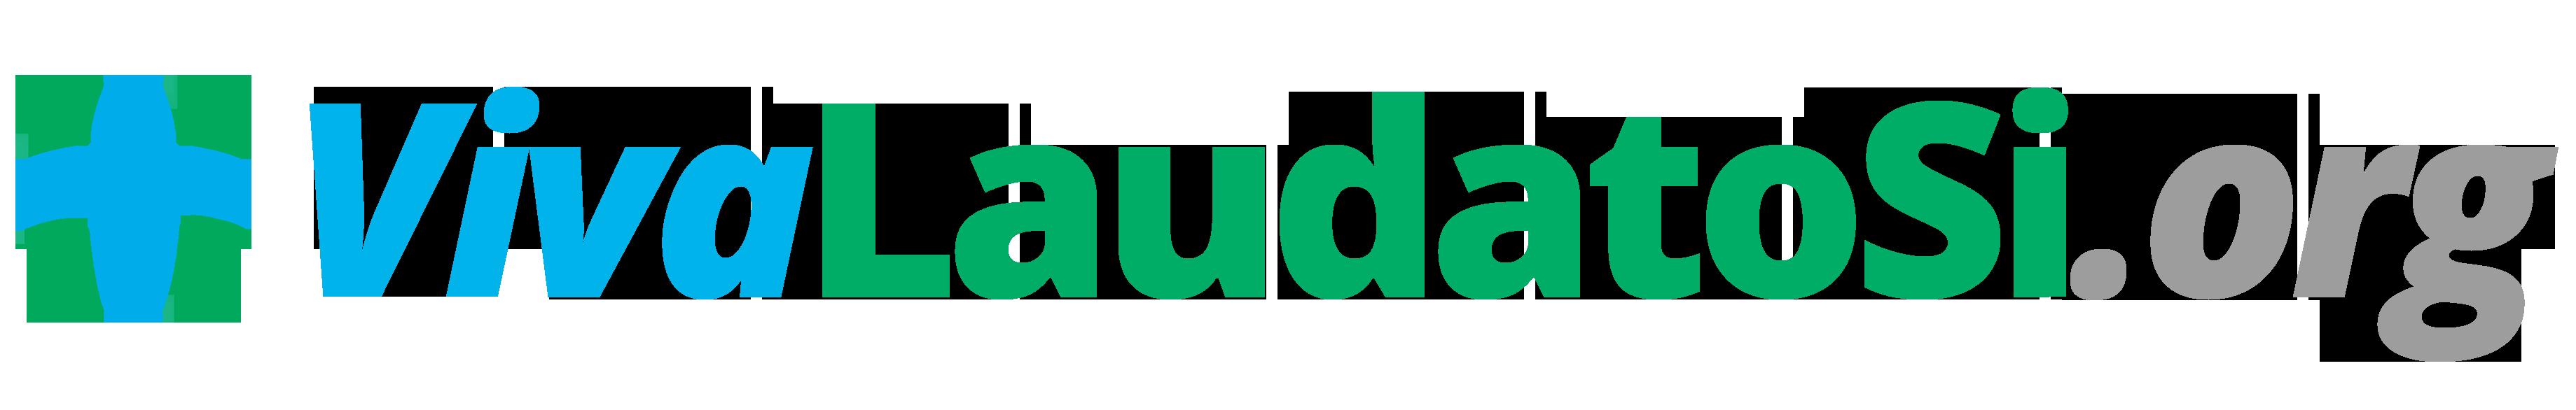 VivaLaudatoSi.org